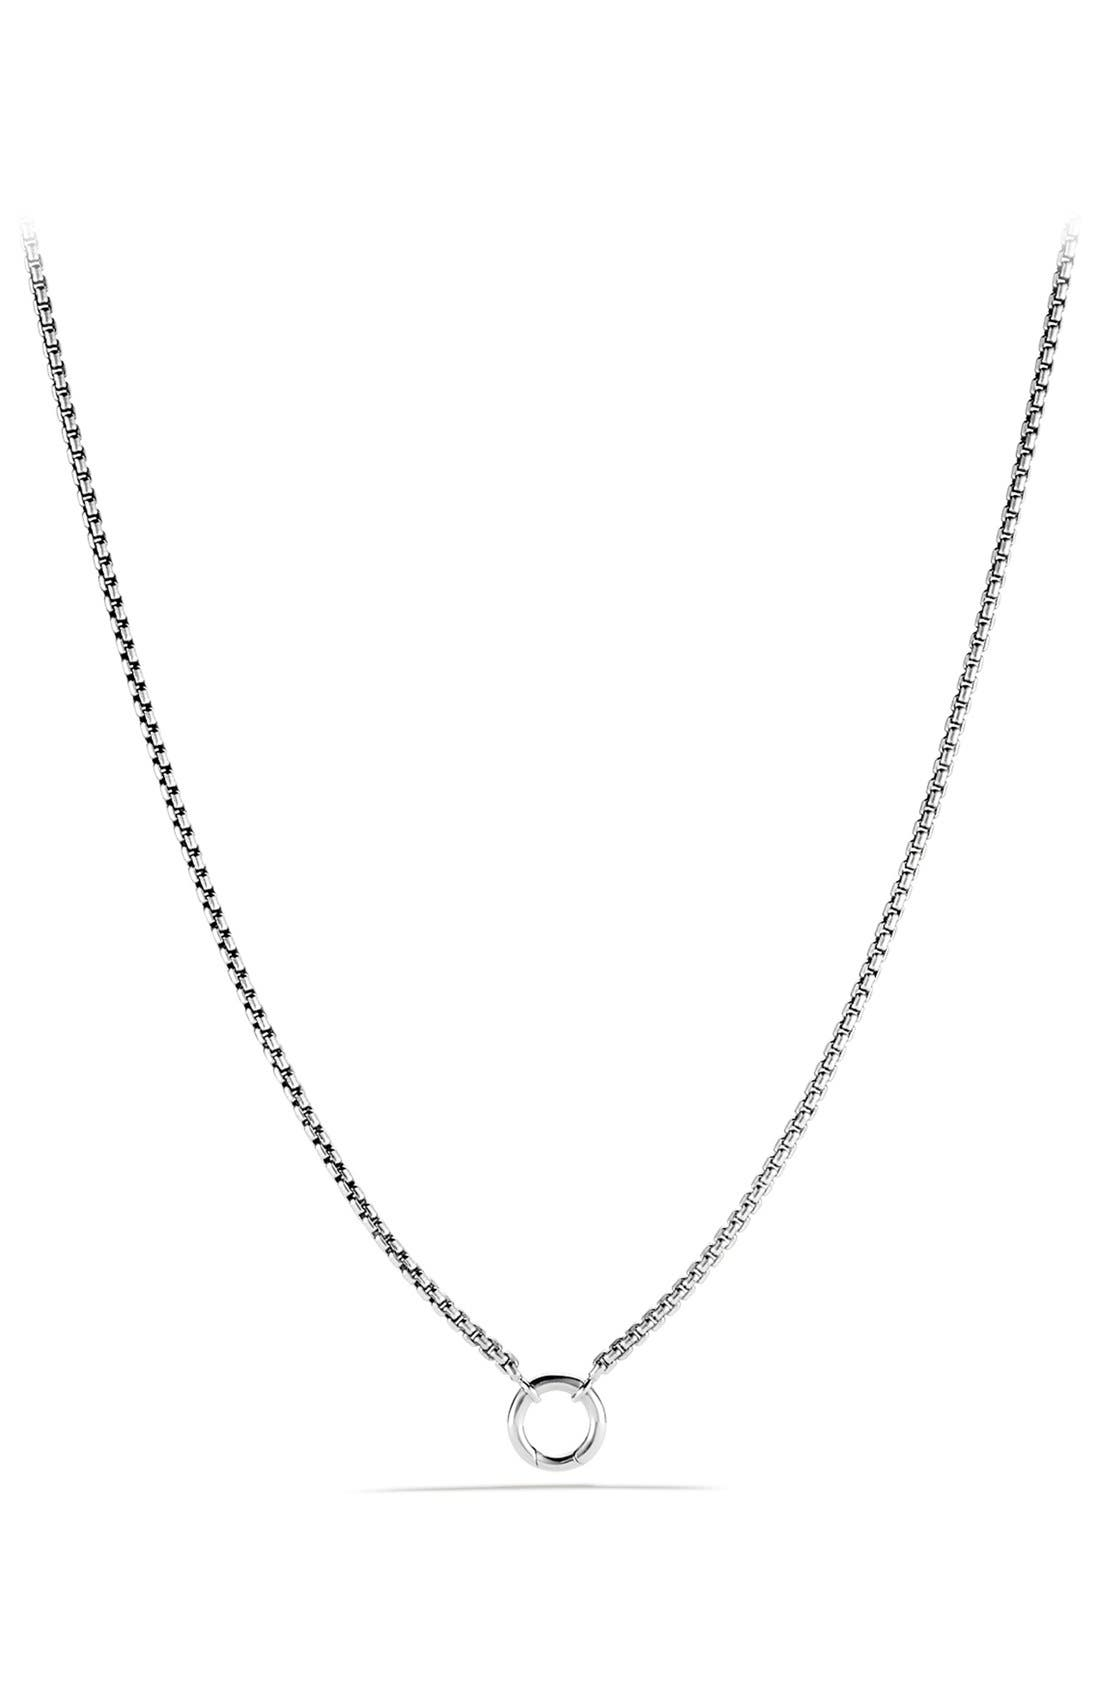 Alternate Image 1 Selected - David Yurman 'Chain' Charm Chain Necklace